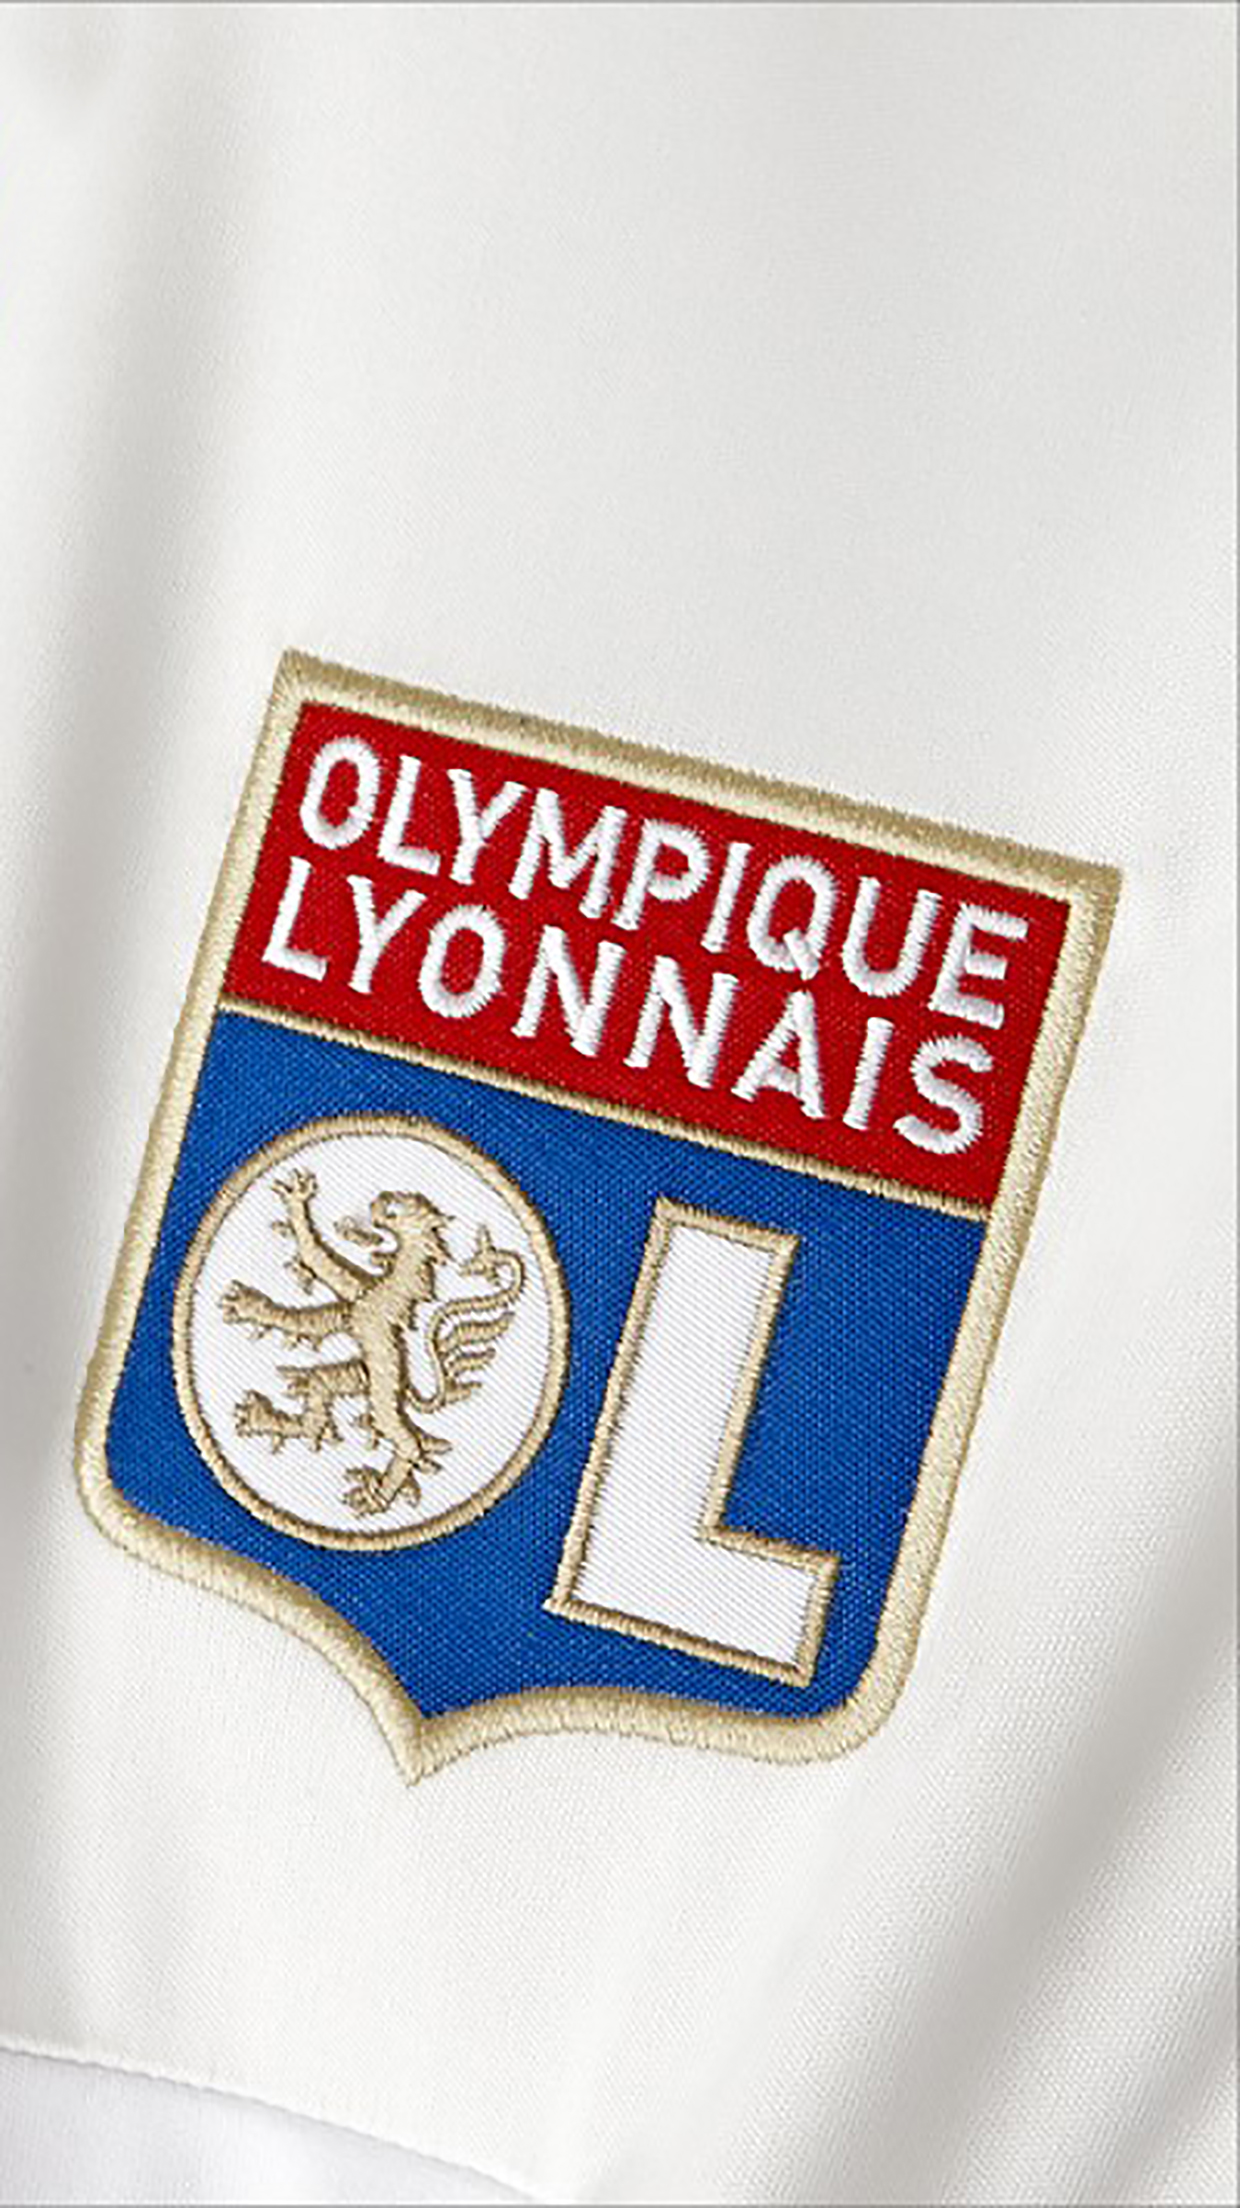 Olympique Lyonnais Logo 1 3Wallpapers iPhone Parallax Olympique Lyonnais : Logo 1